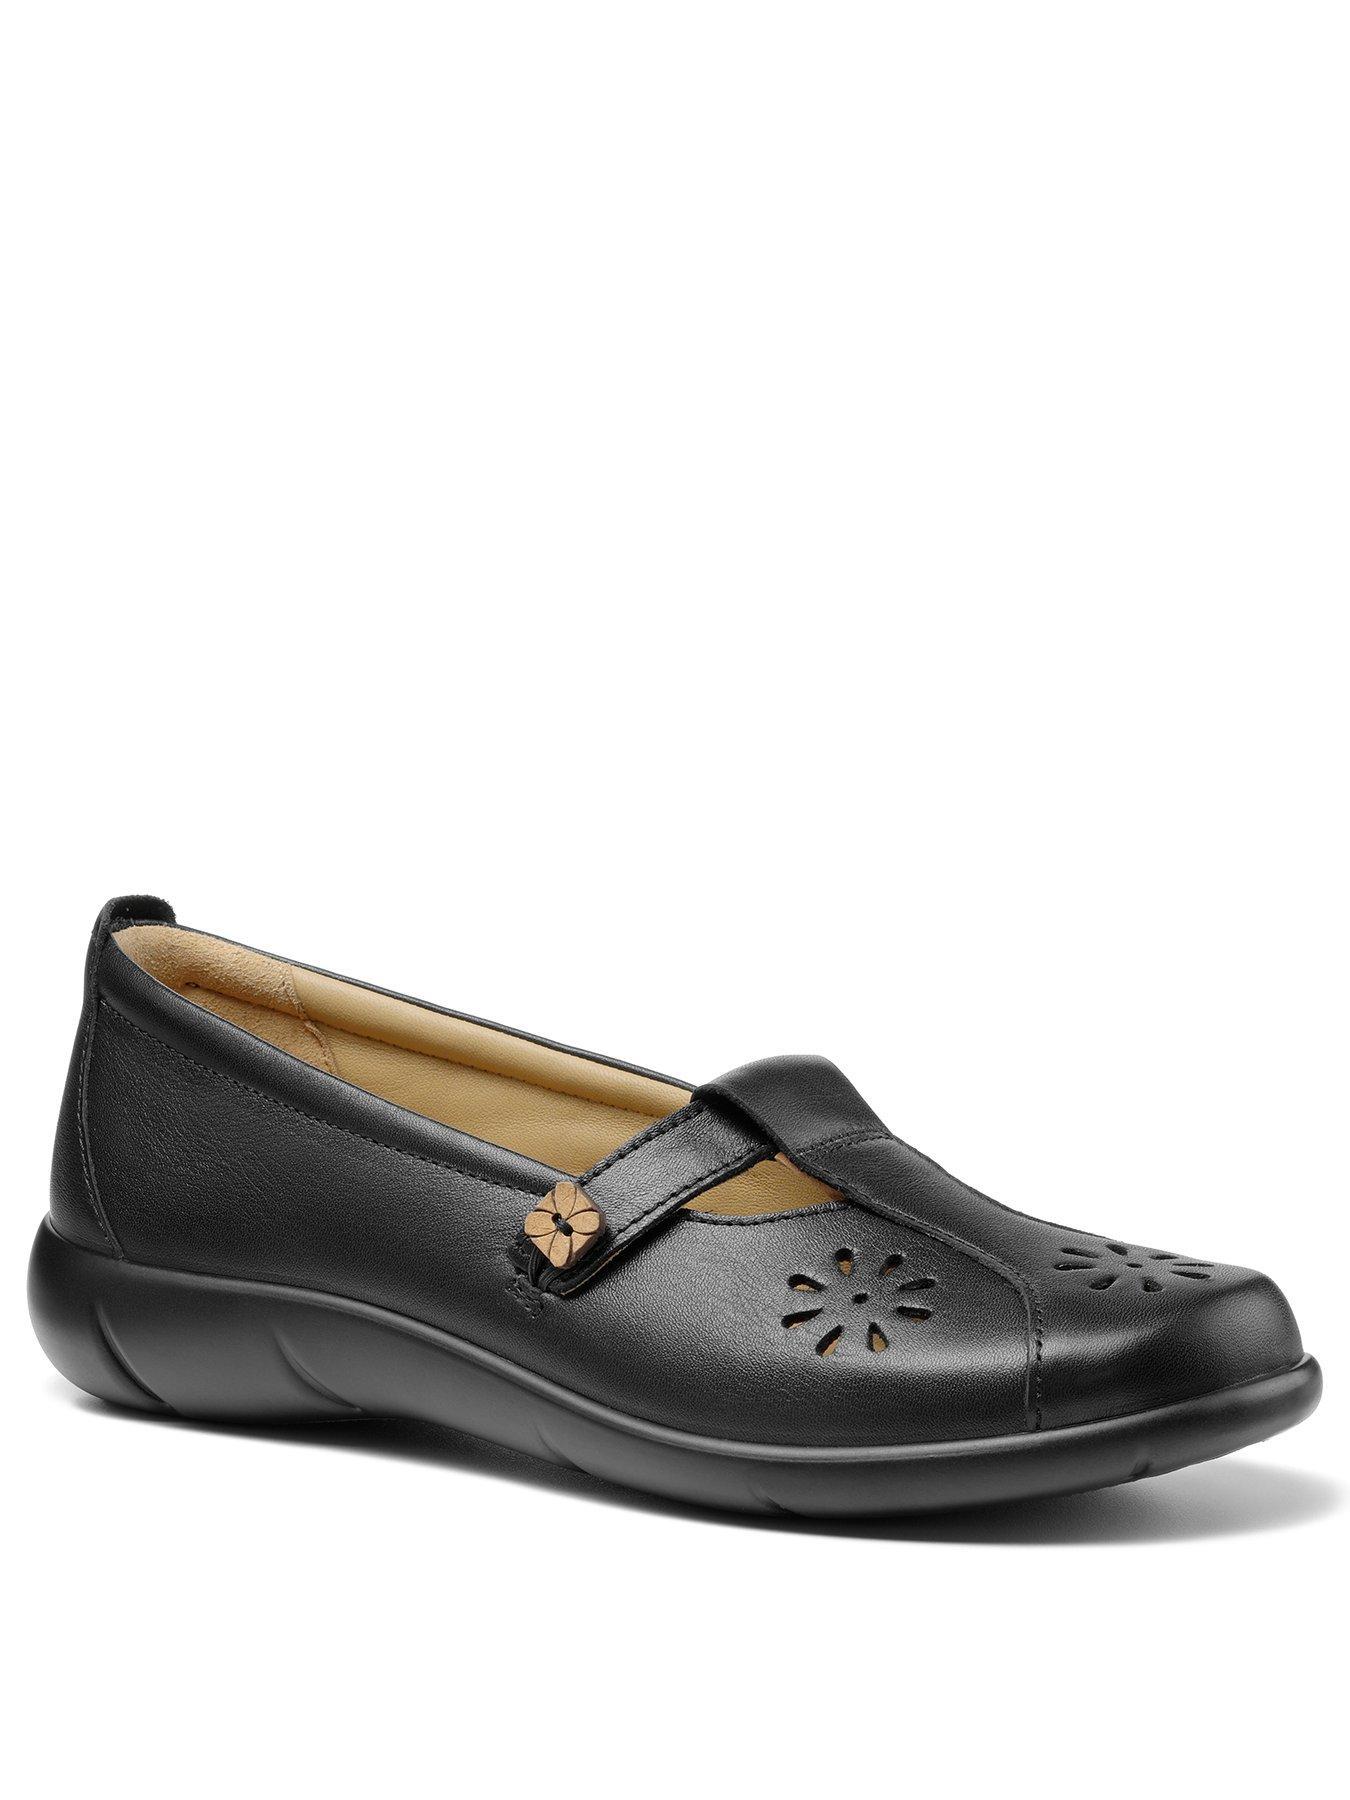 Black | Hotter | Shoes \u0026 boots | Women